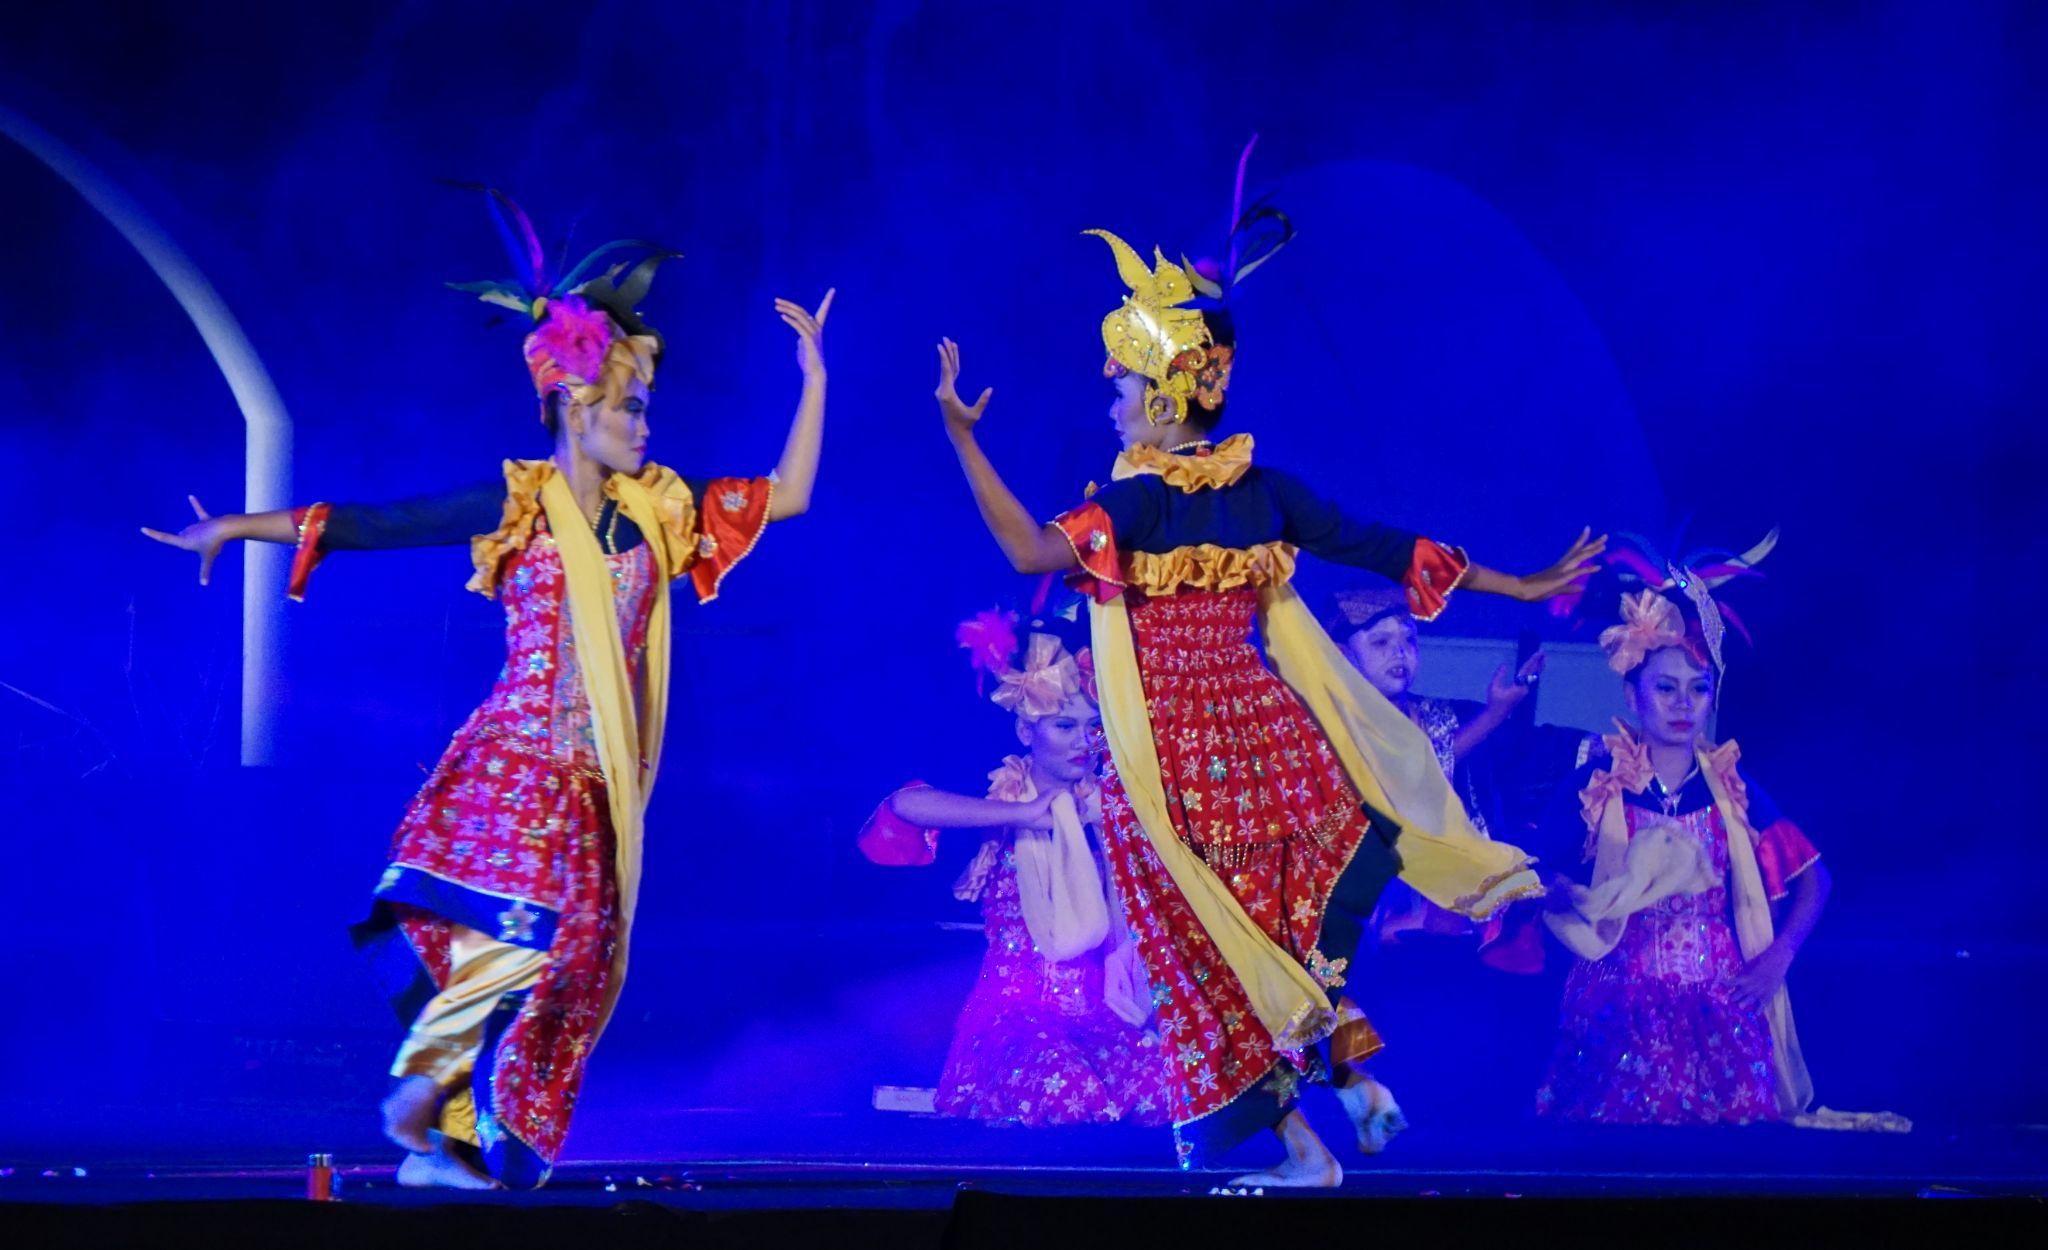 IIMF 2014 by Ferry Chandra